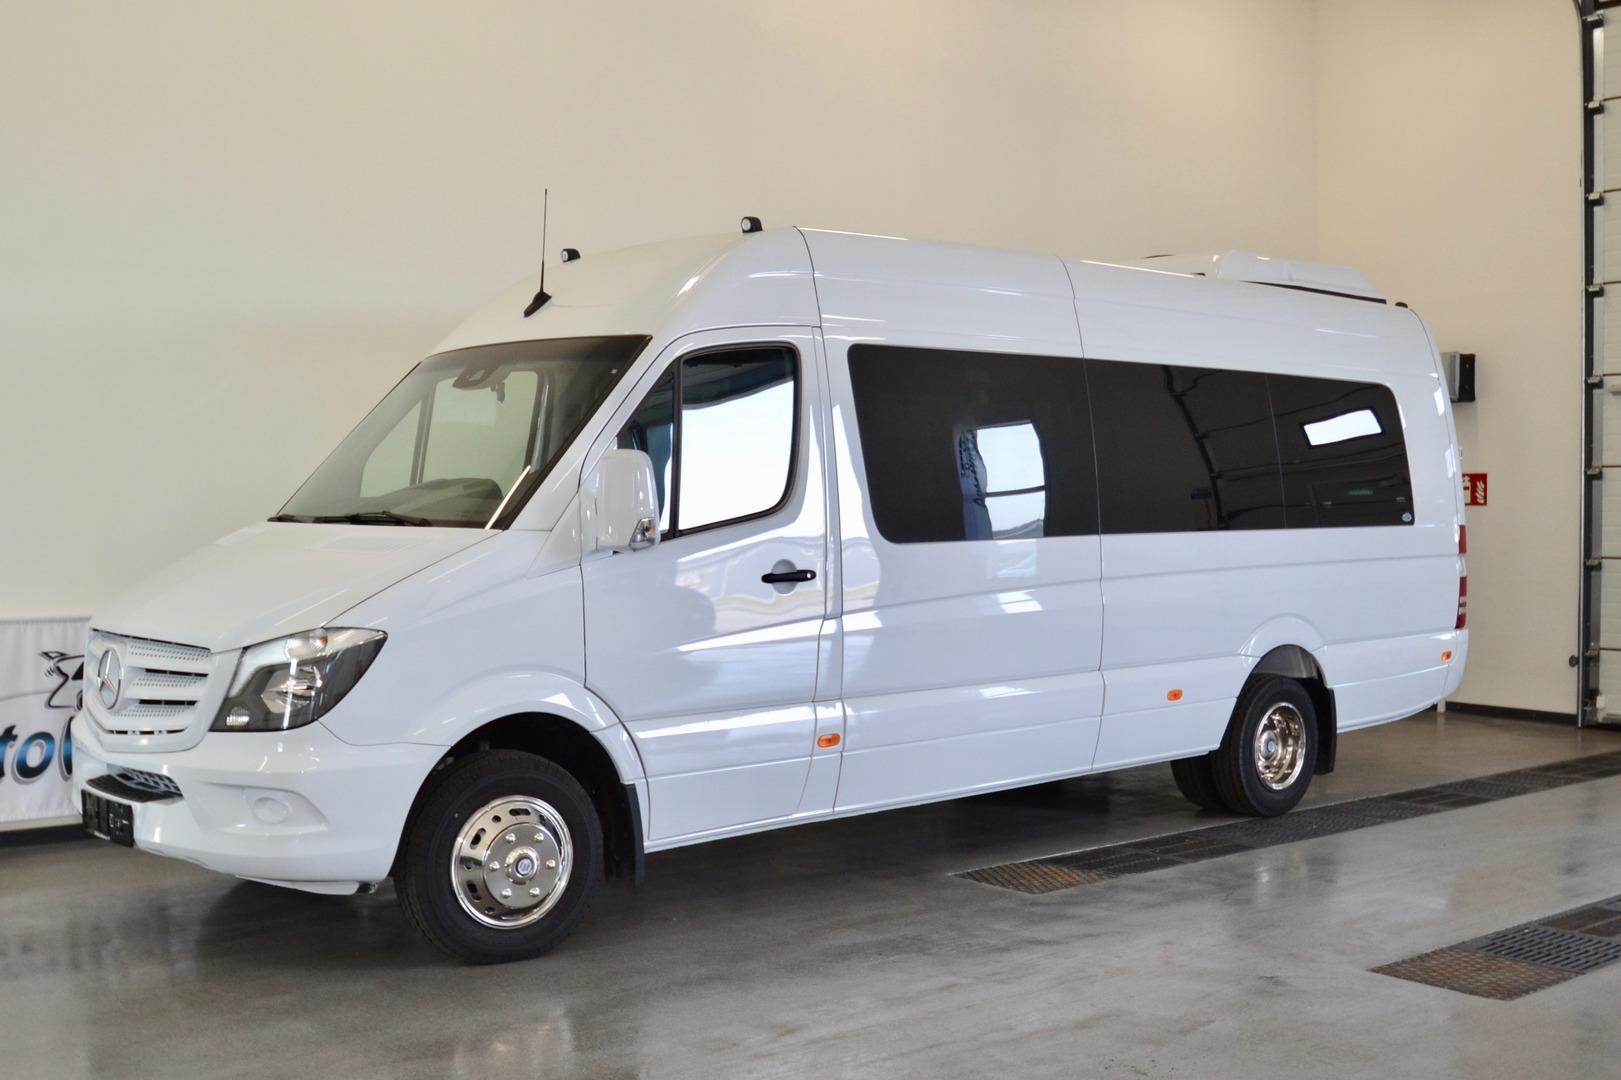 Mercedes-Benz Sprinter, 516 CDI Ilesbus